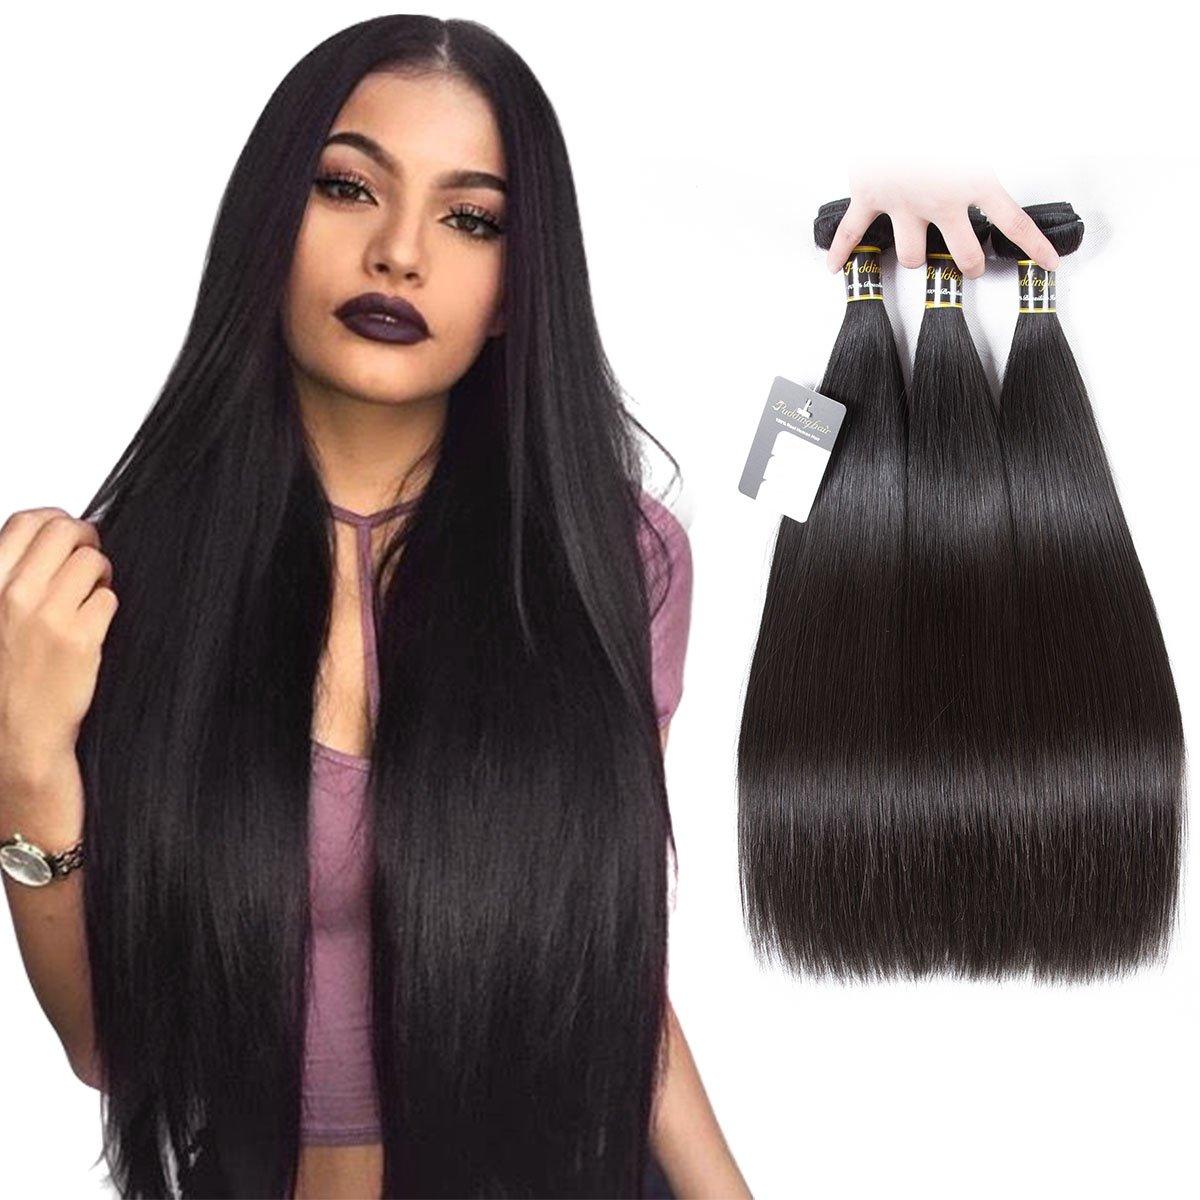 Amazon Beauty Princess 8a Brazilian Virgin Hair Body Wave 3